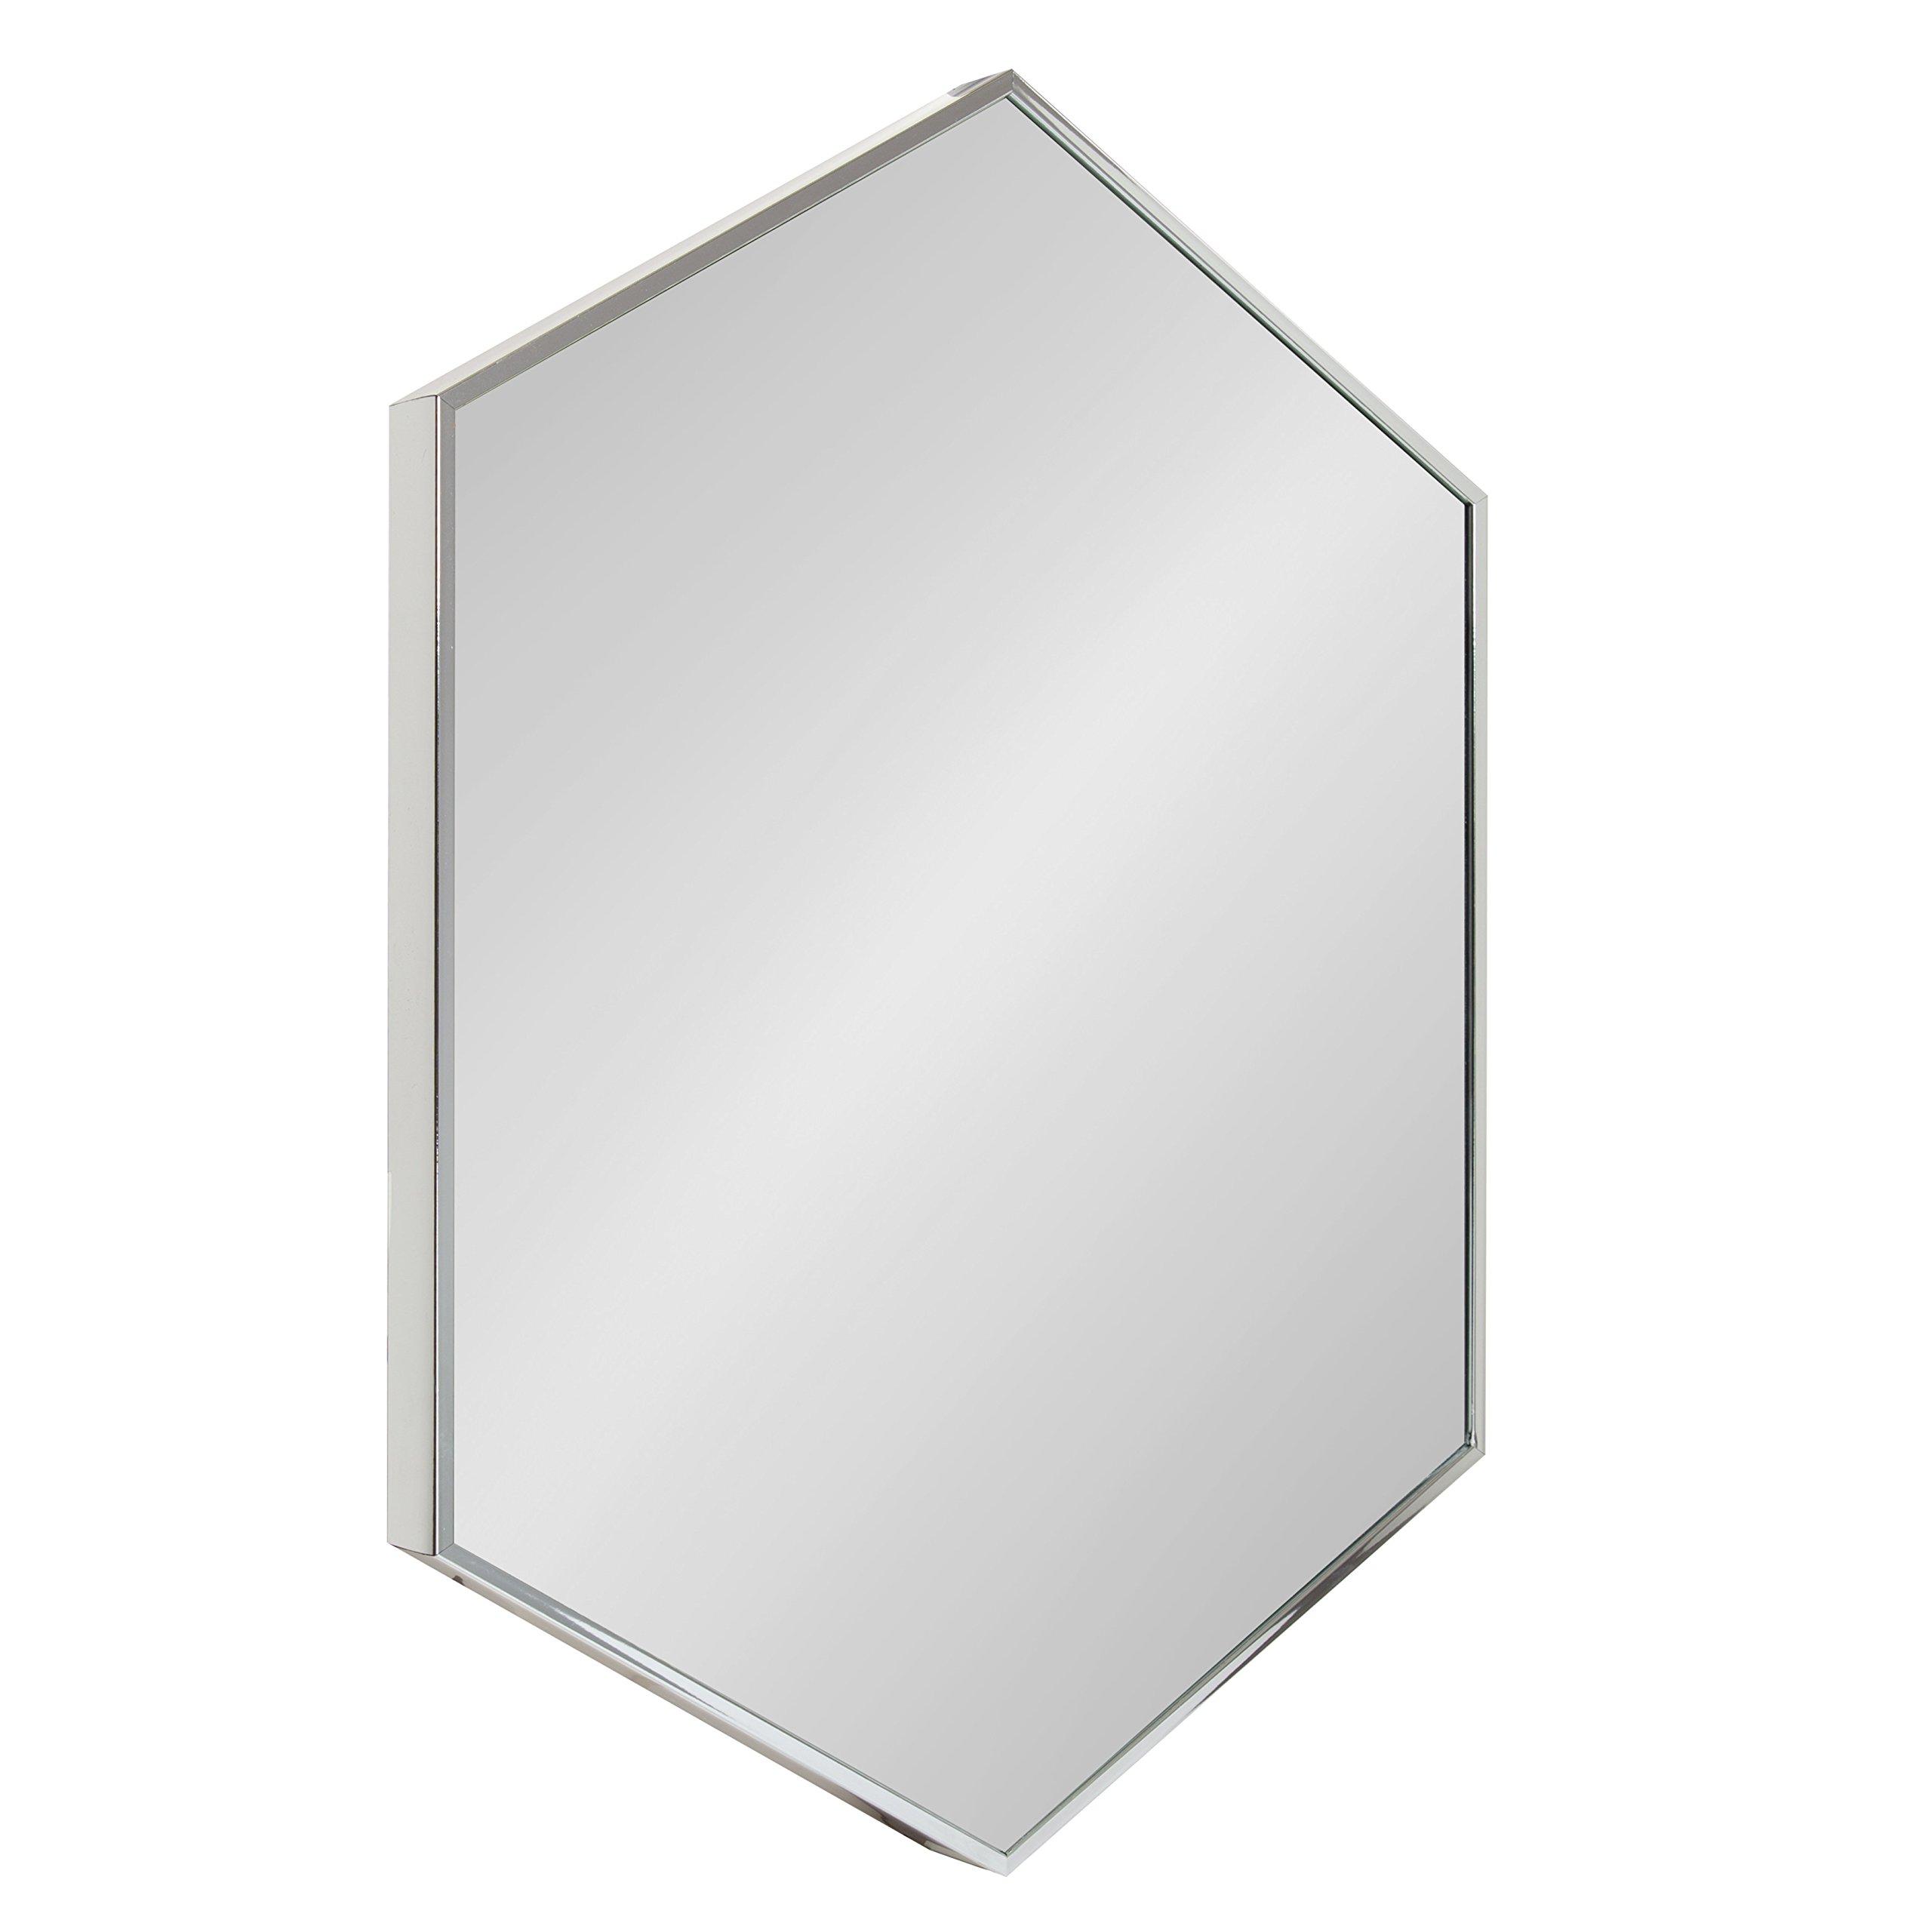 Amazon Com Kate And Laurel Rhodes Modern Hexagon Wall Mirror Silver Chrome 31x22 Inches Home Kitchen